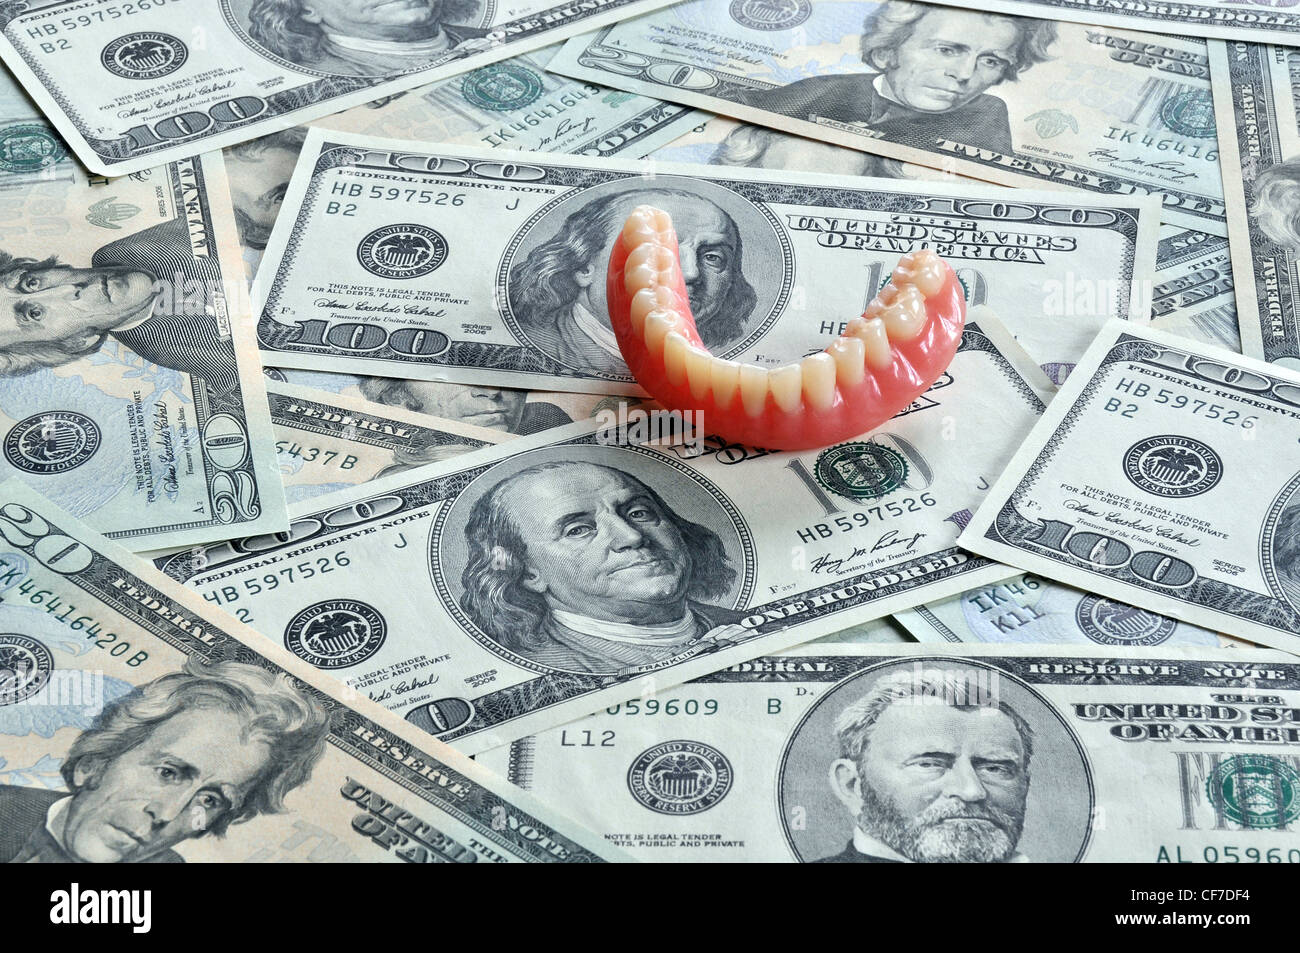 denture on dollar notes - Stock Image